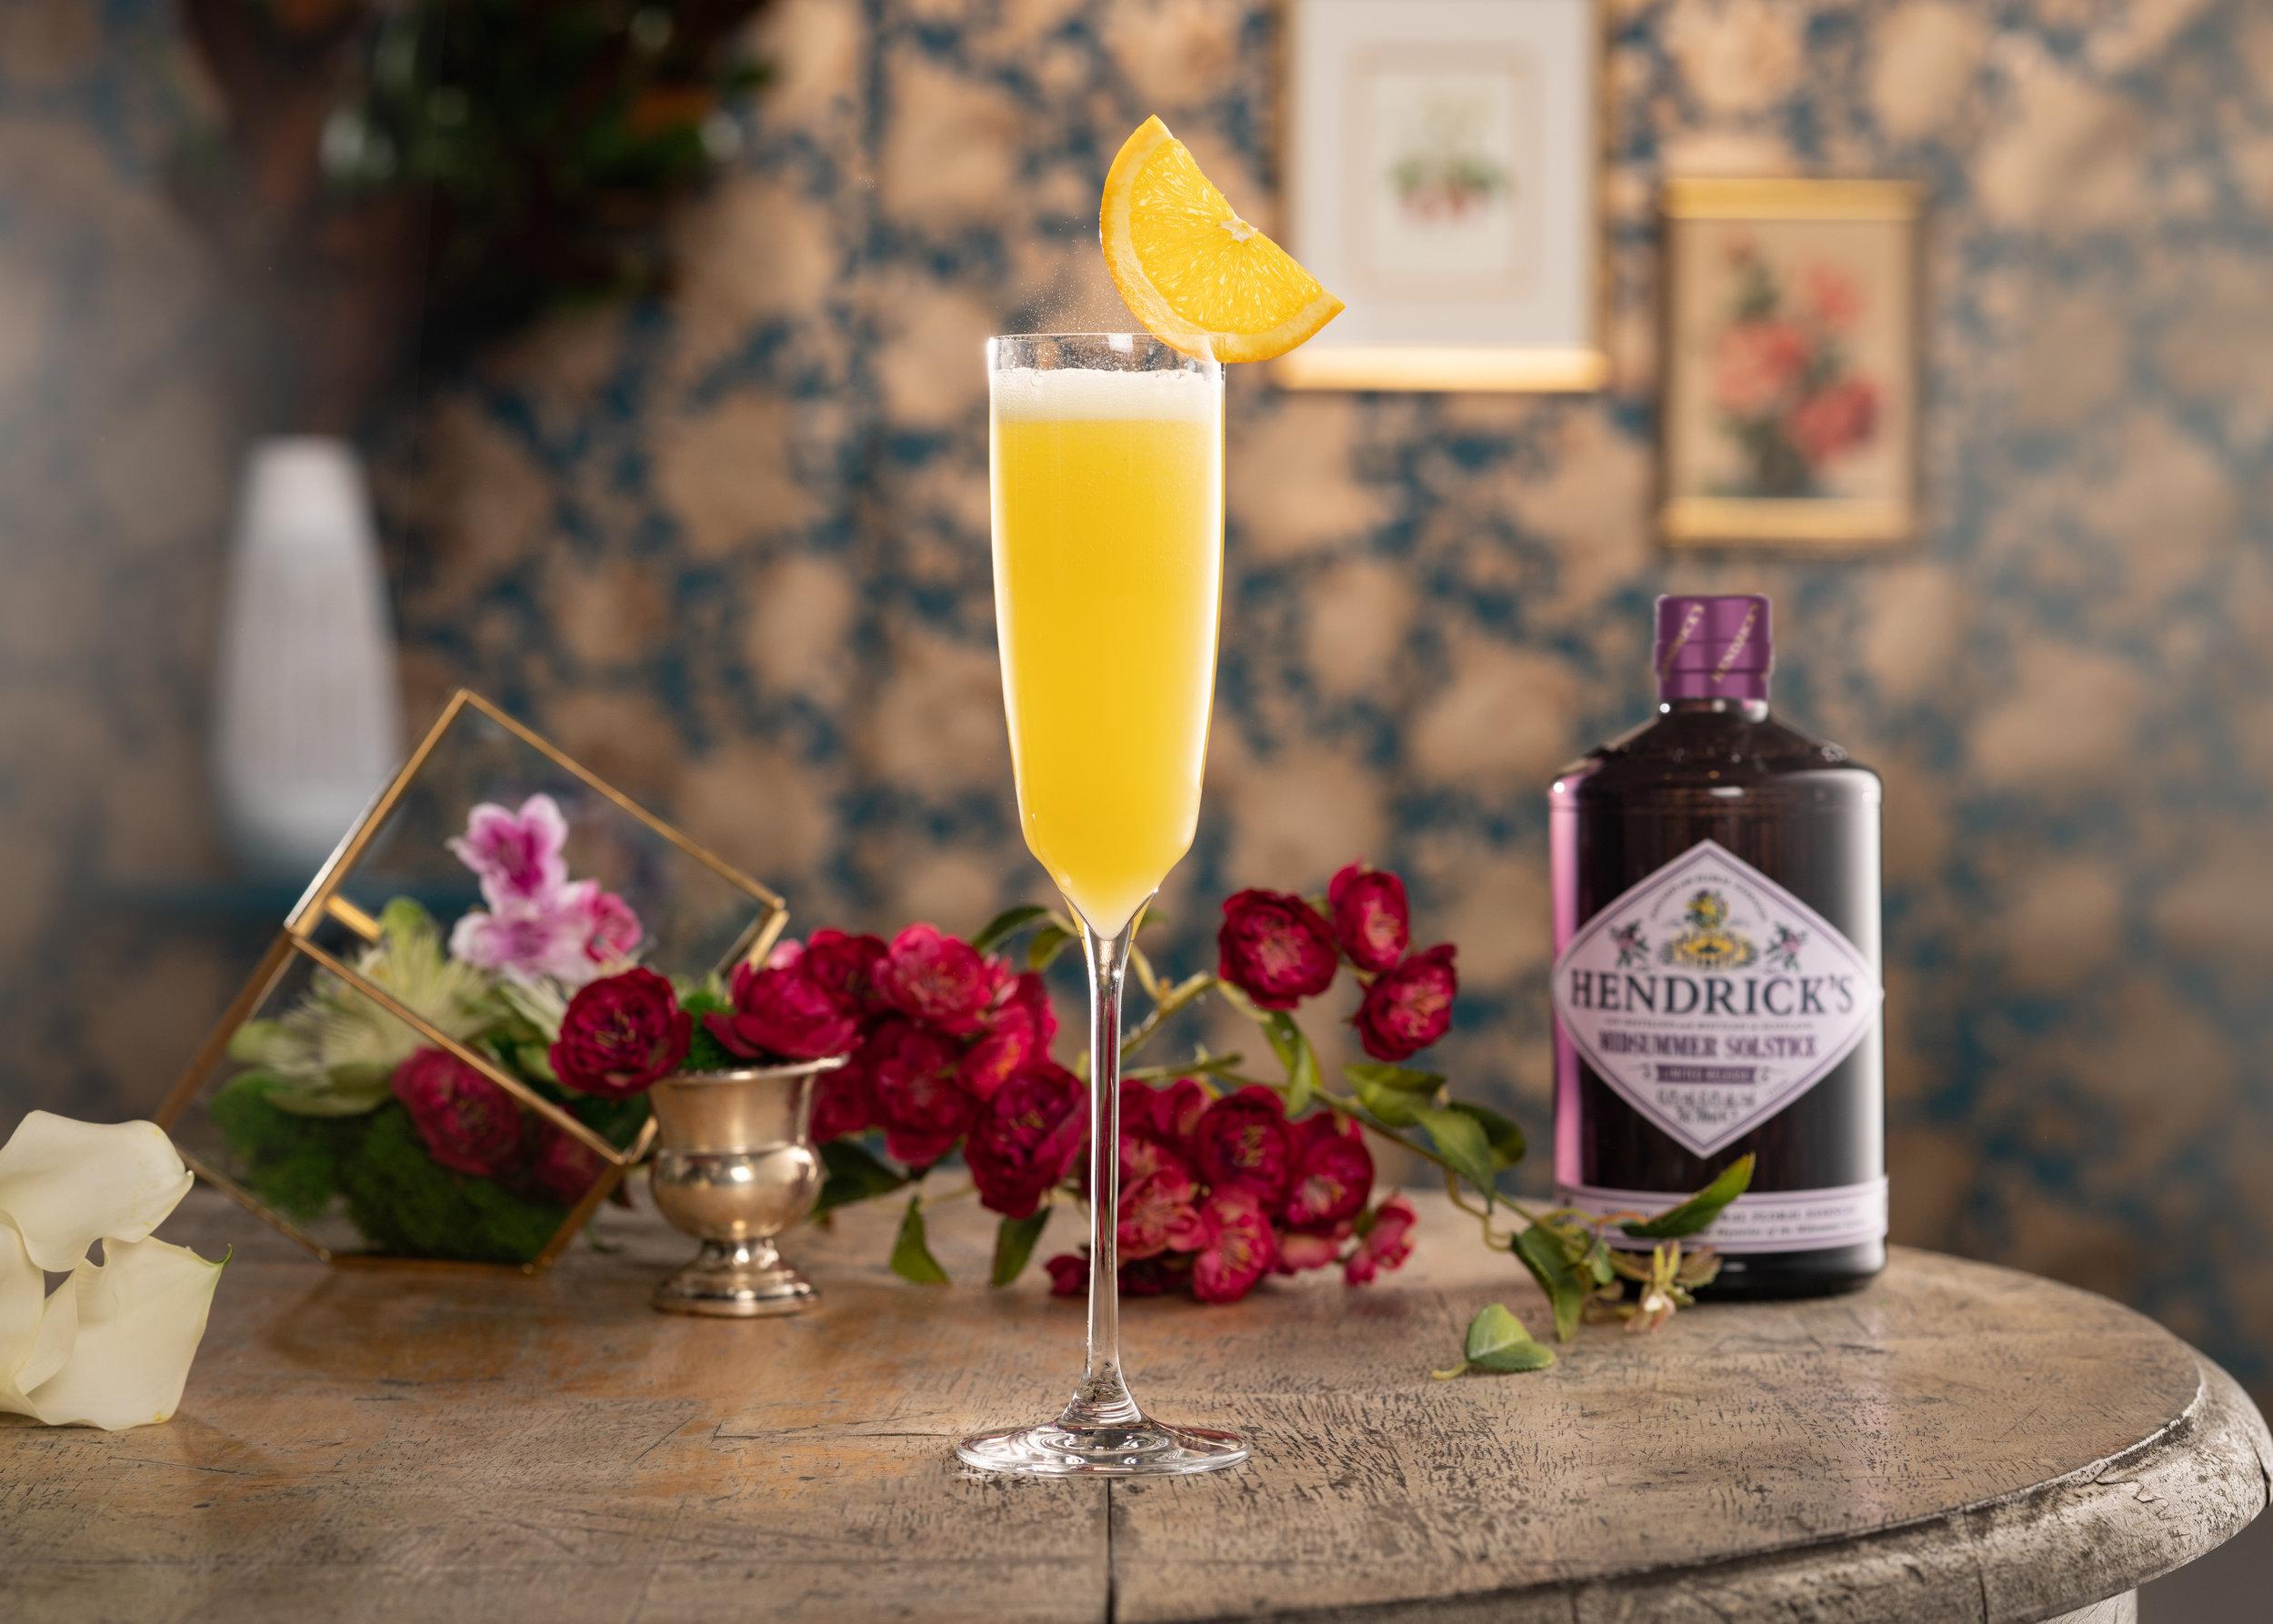 Hendrick's Gin Midsummer Solstice Mimosa